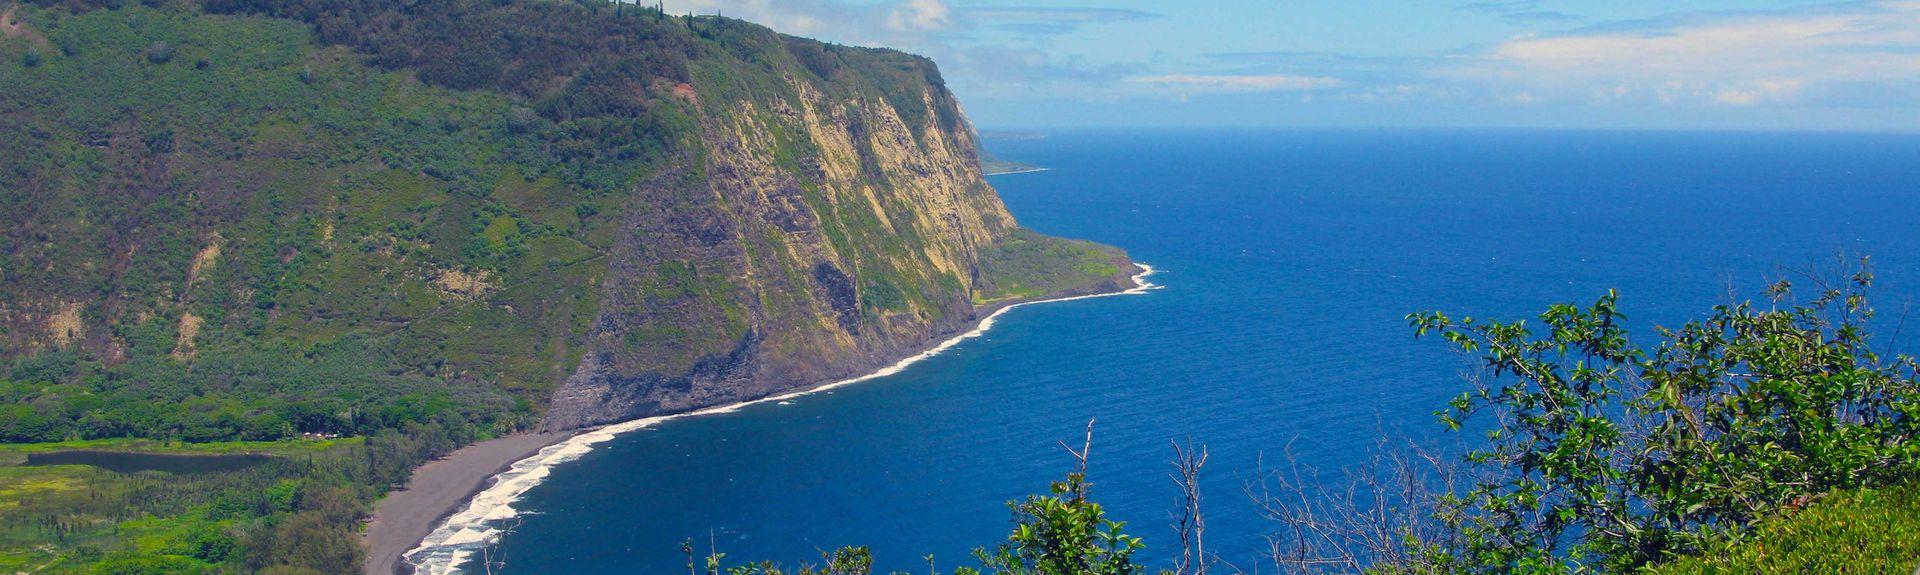 Manini'owali Beach, Kailua-Kona, Hawaii, United States of America